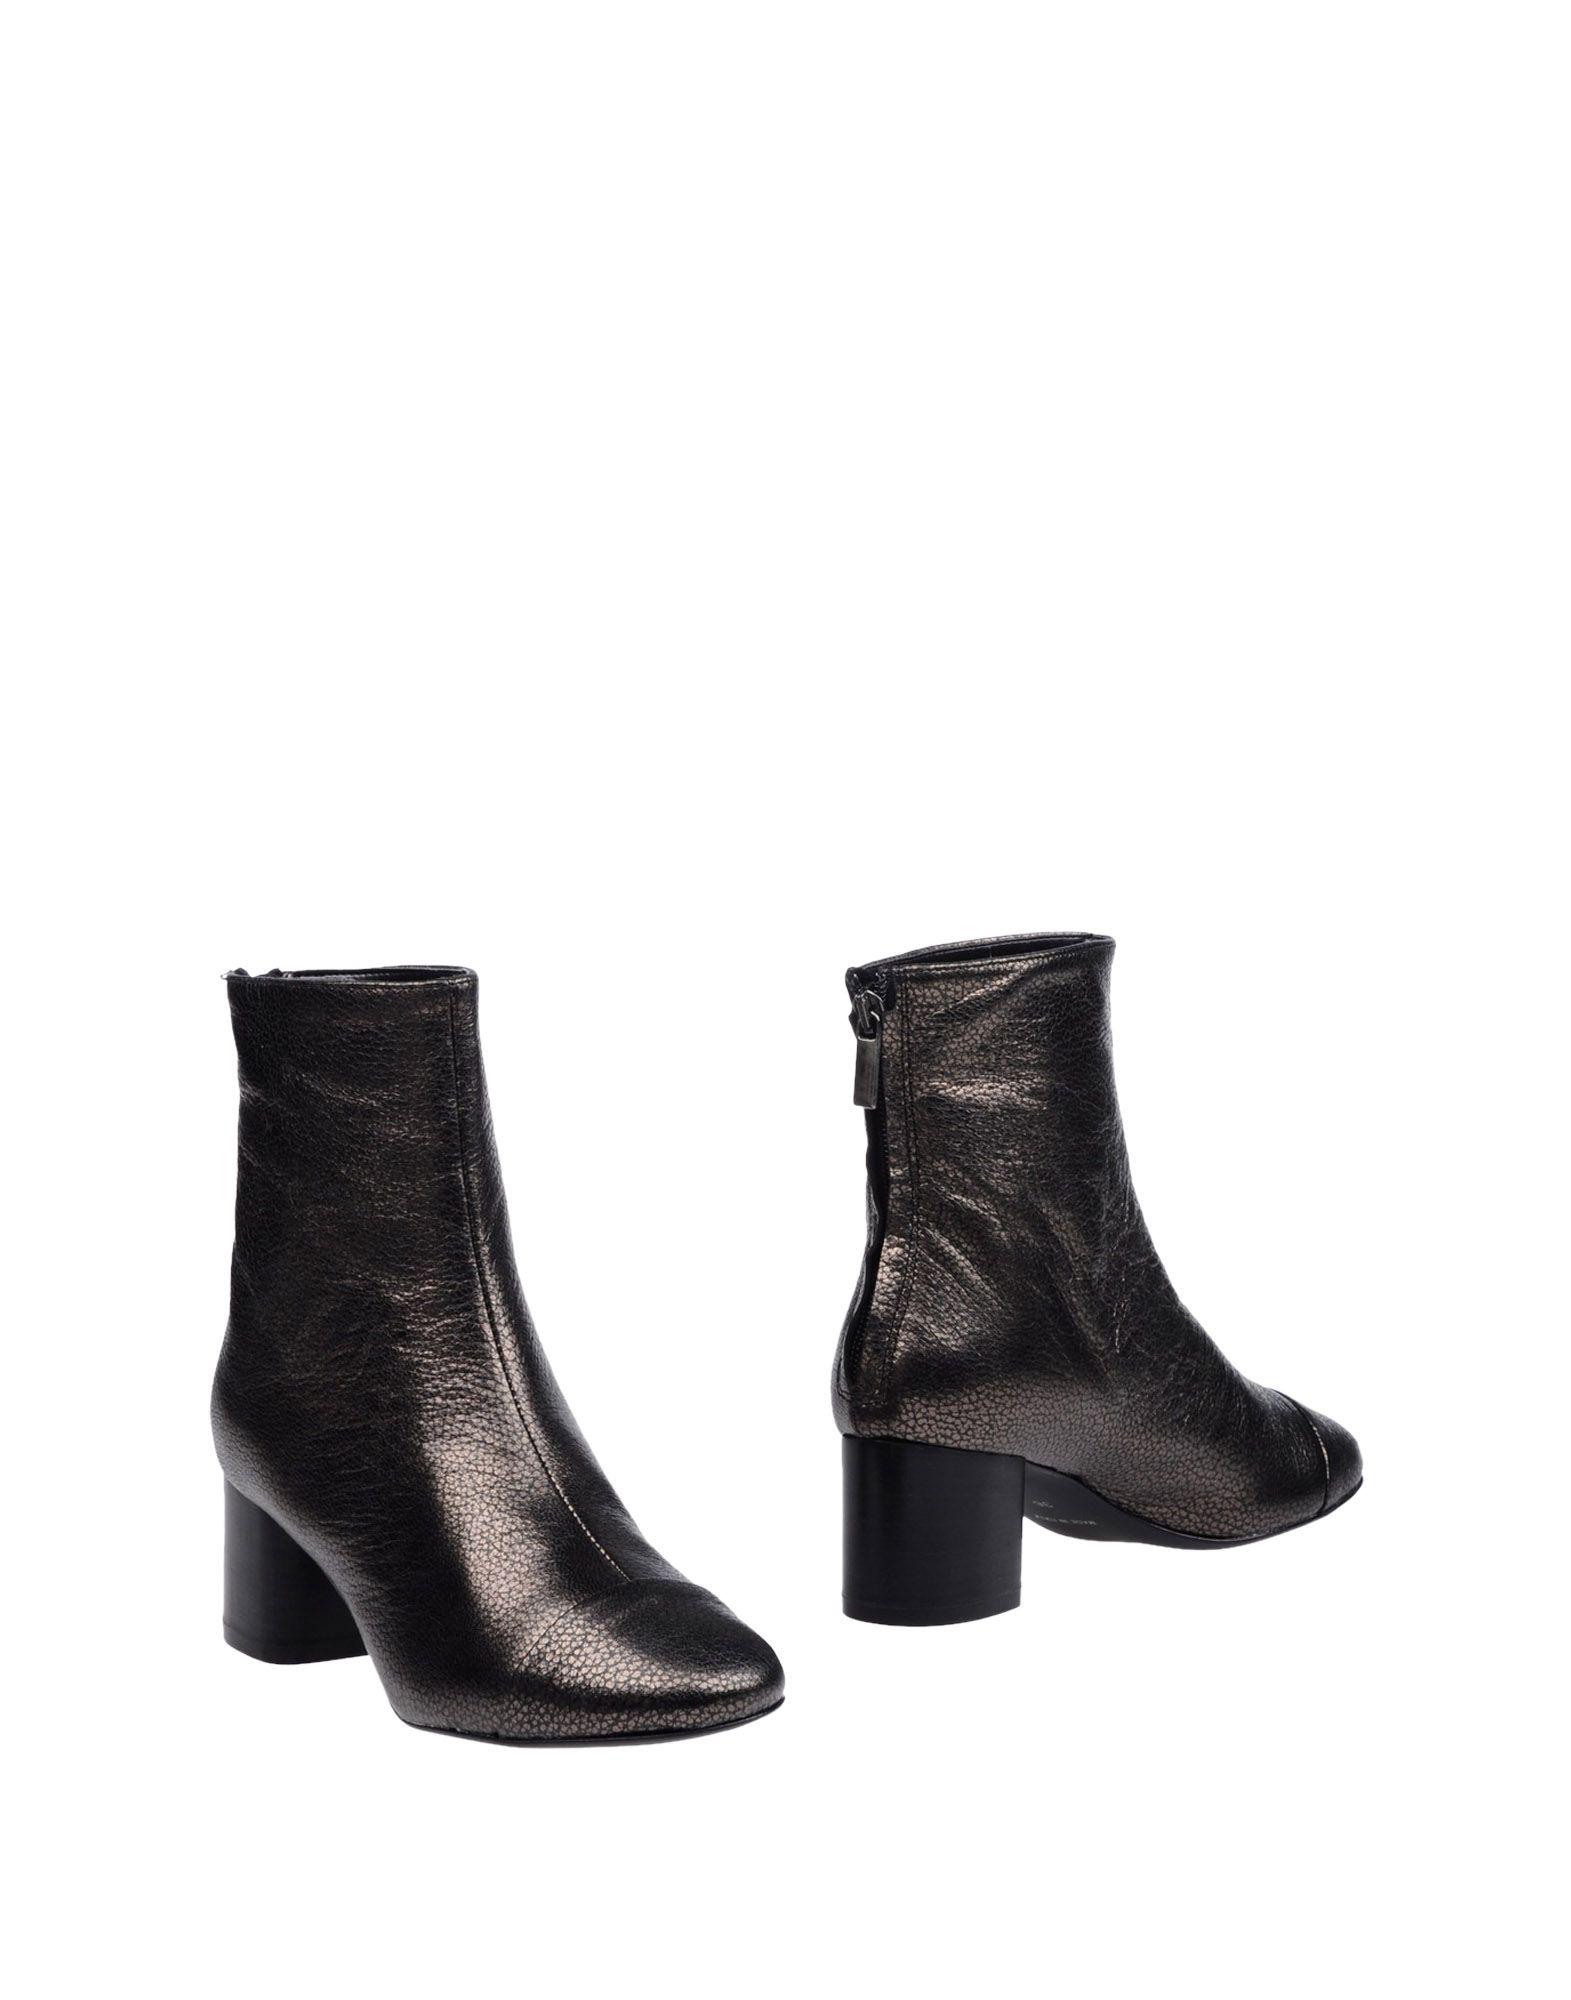 Bagatt Stiefelette Schuhe Damen  11283174KC Gute Qualität beliebte Schuhe Stiefelette a80221